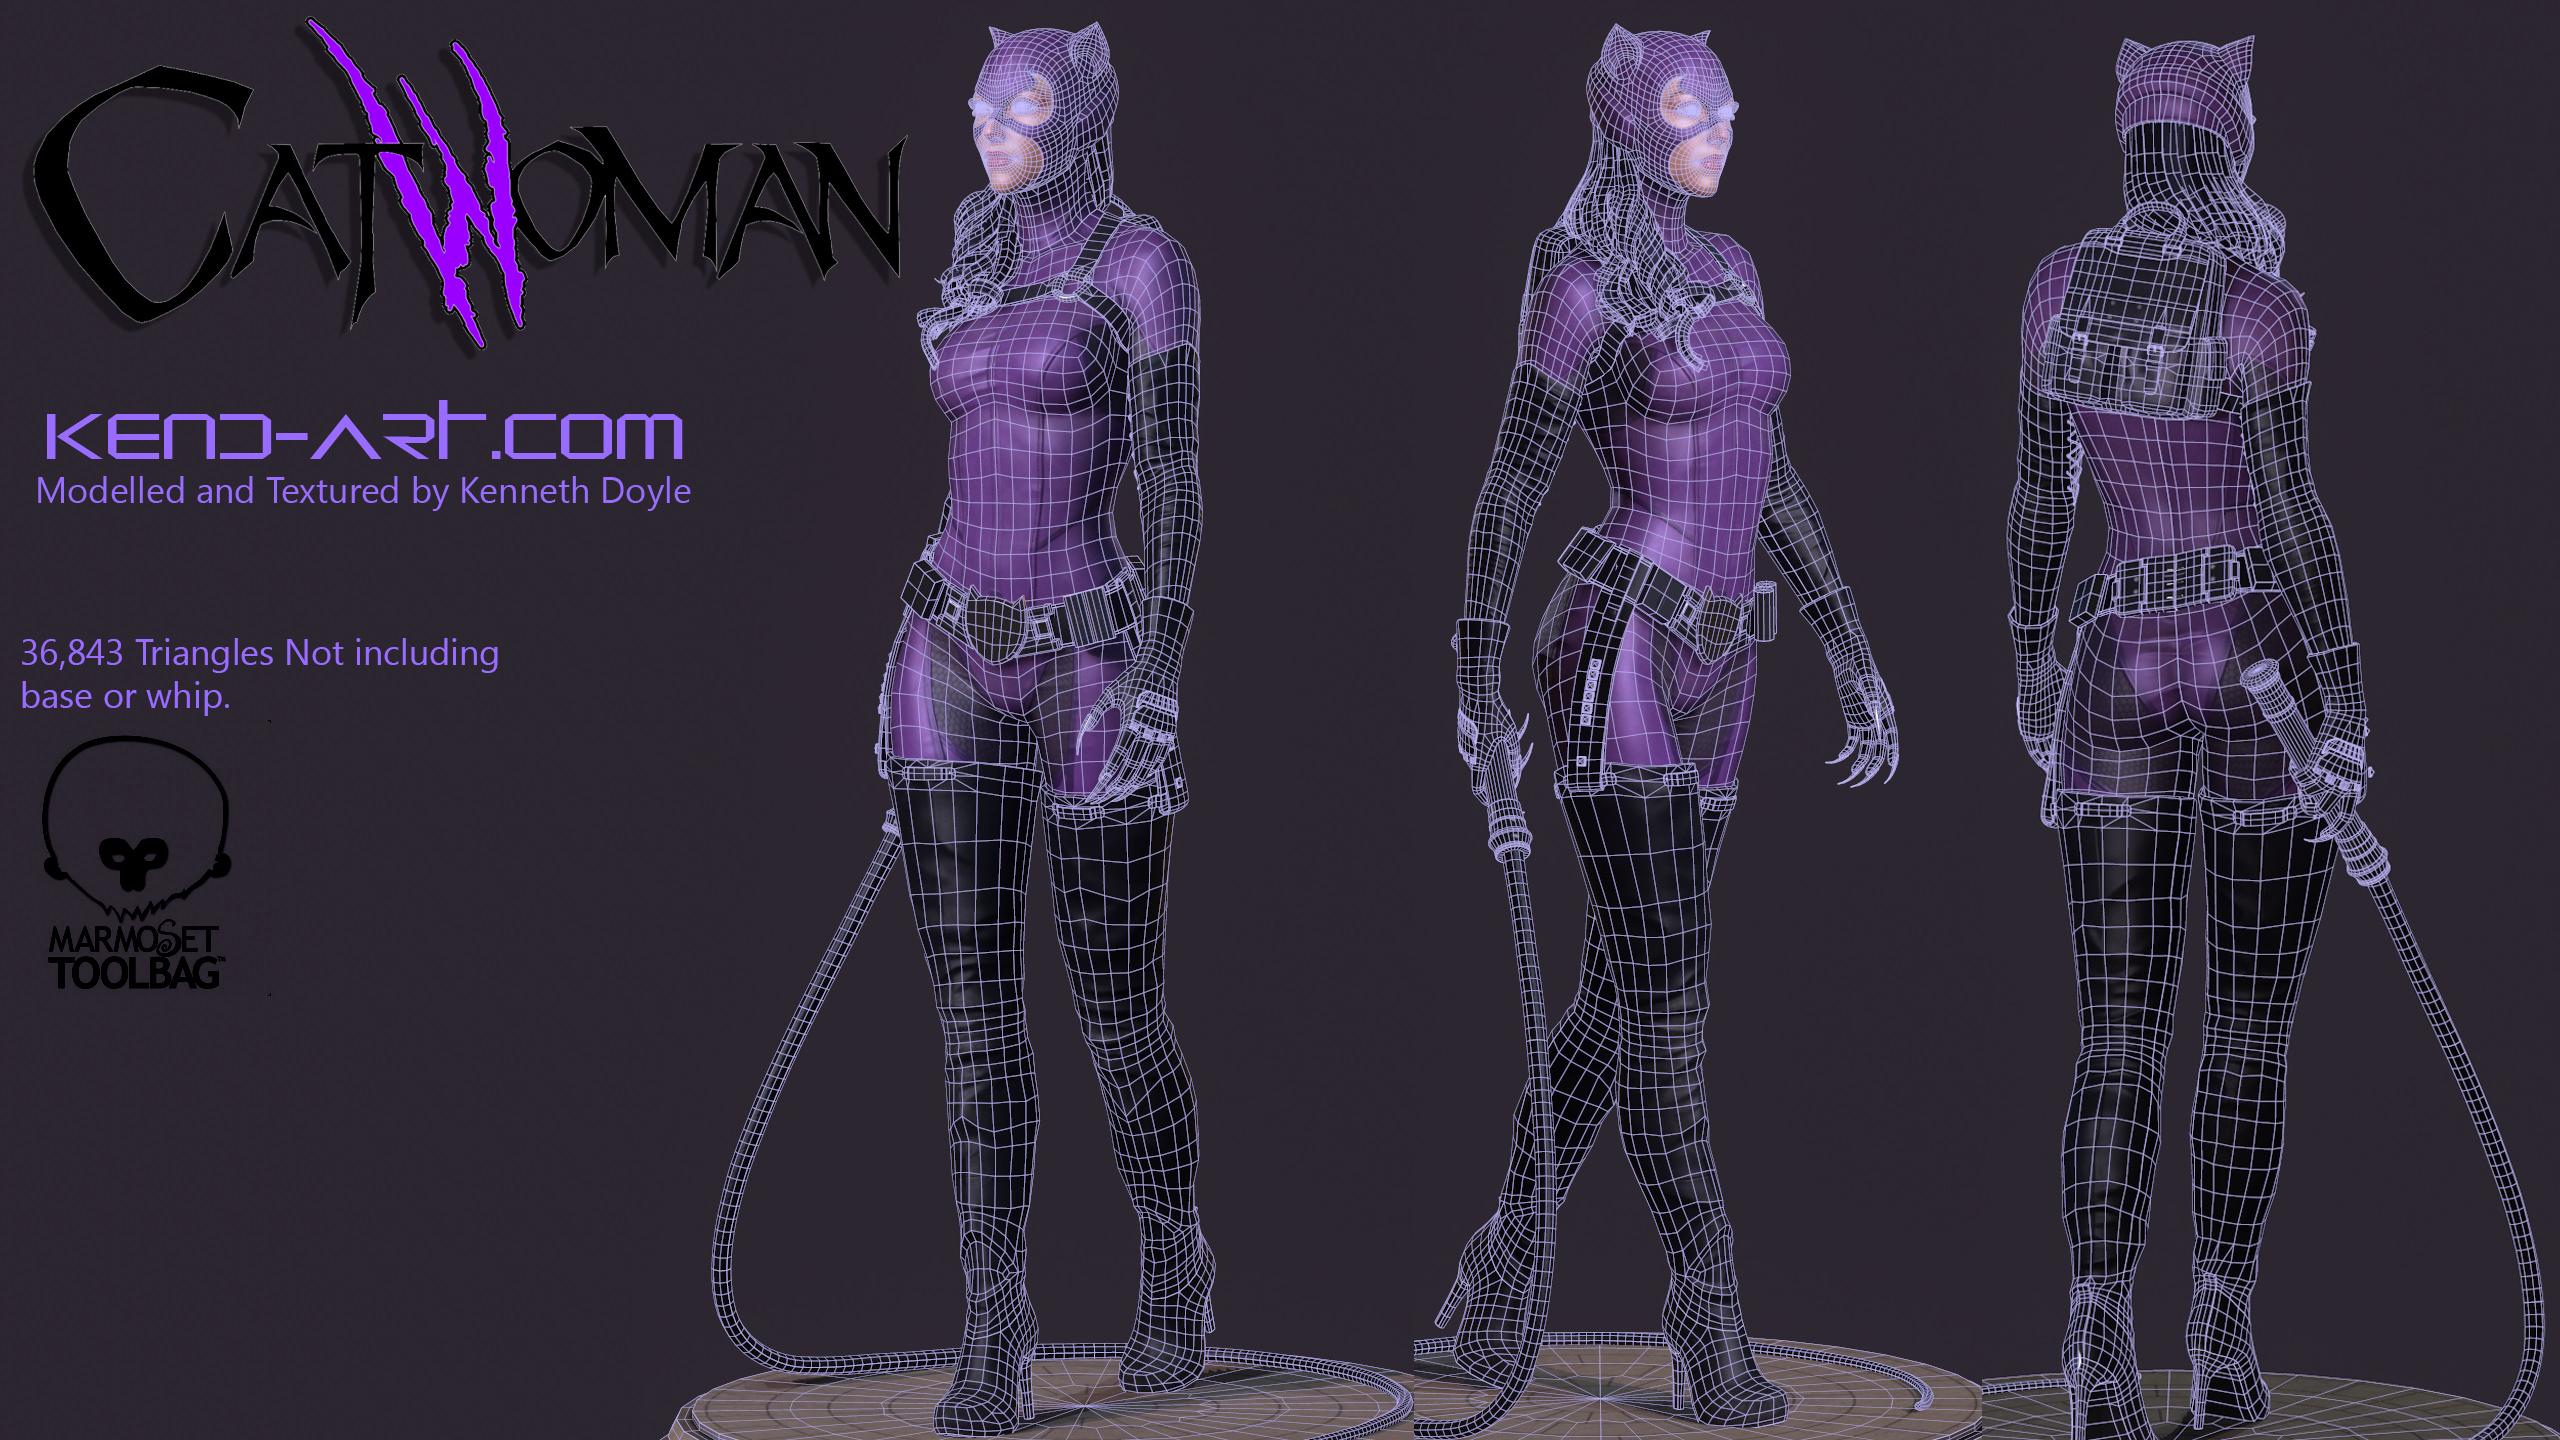 catwoman___wireframe_by_kdoyle9-d7vpdda.jpg